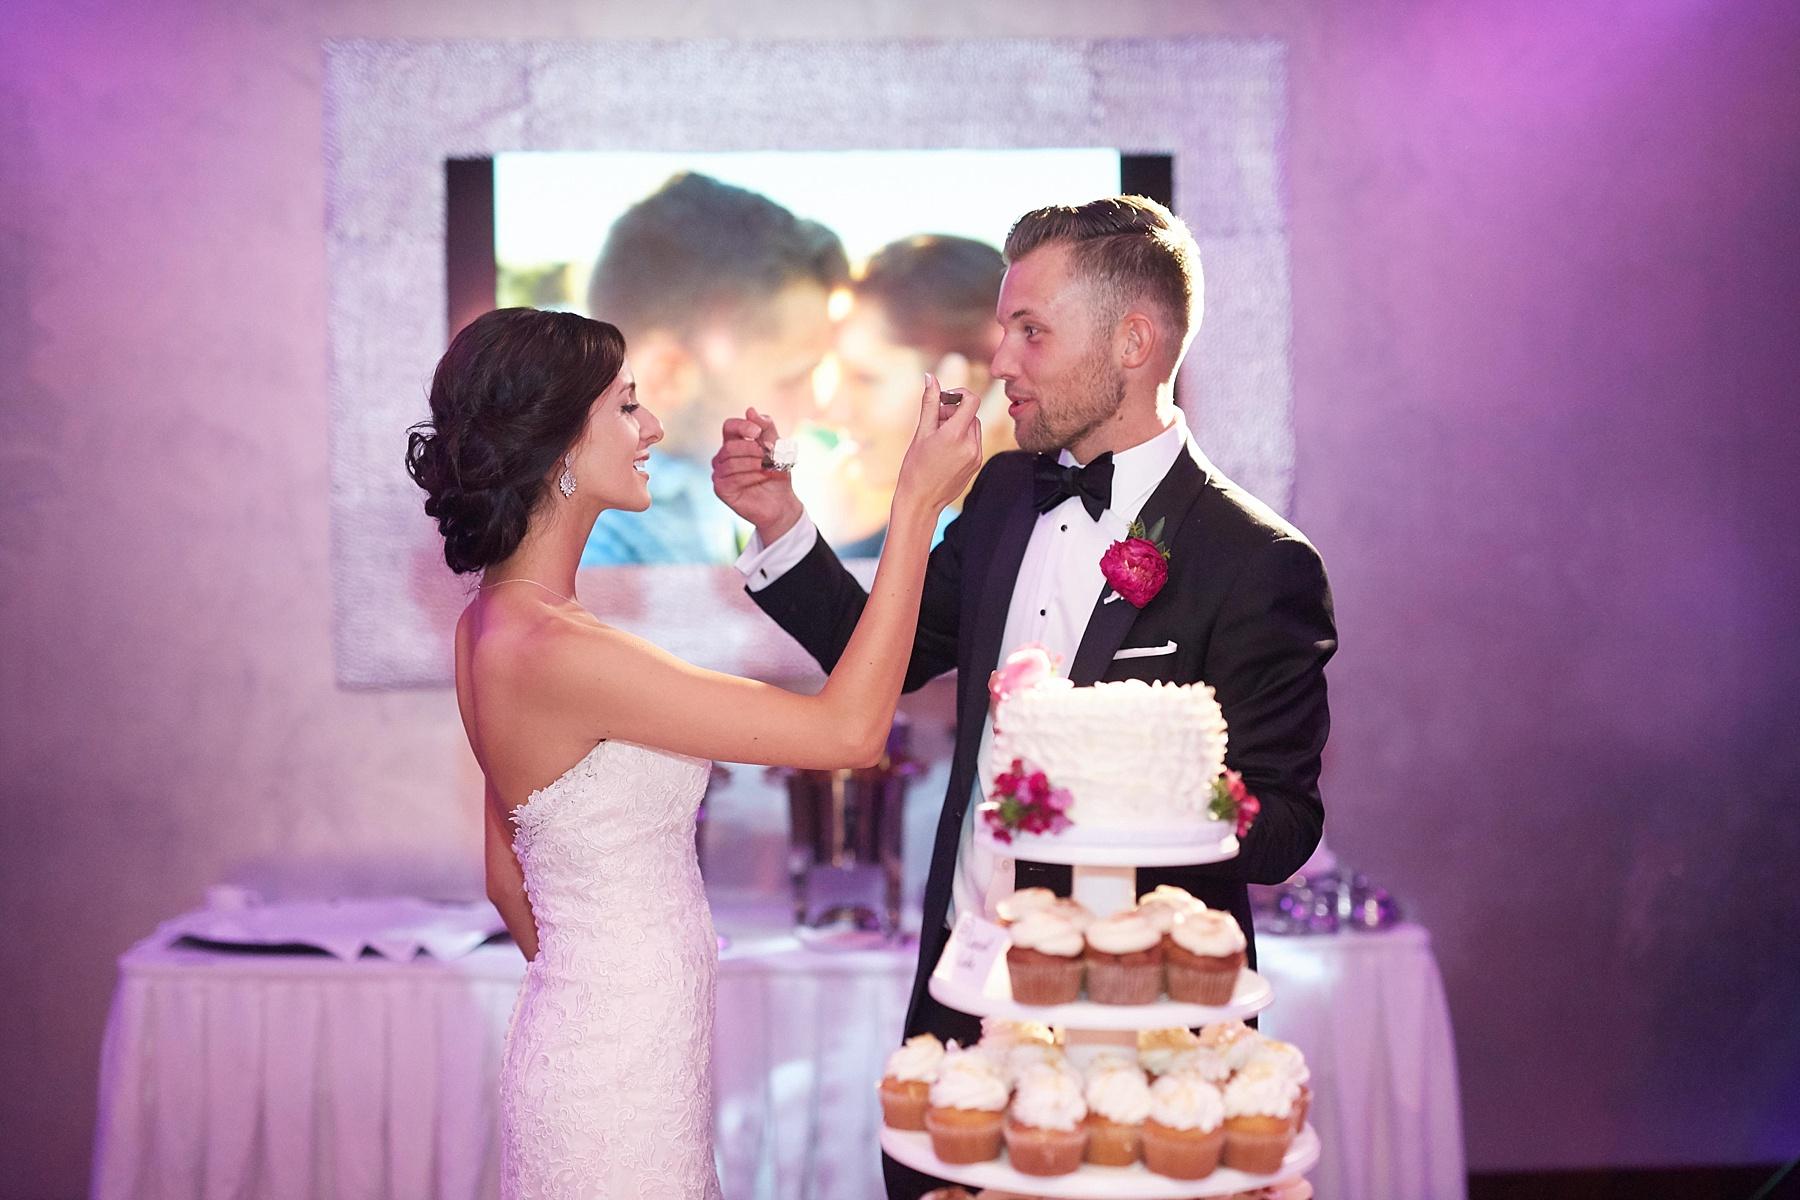 ABULAE-Wedding-Saint-paul-MN-Josh-Sofia-Wedding-Mears-Park_0853.jpg